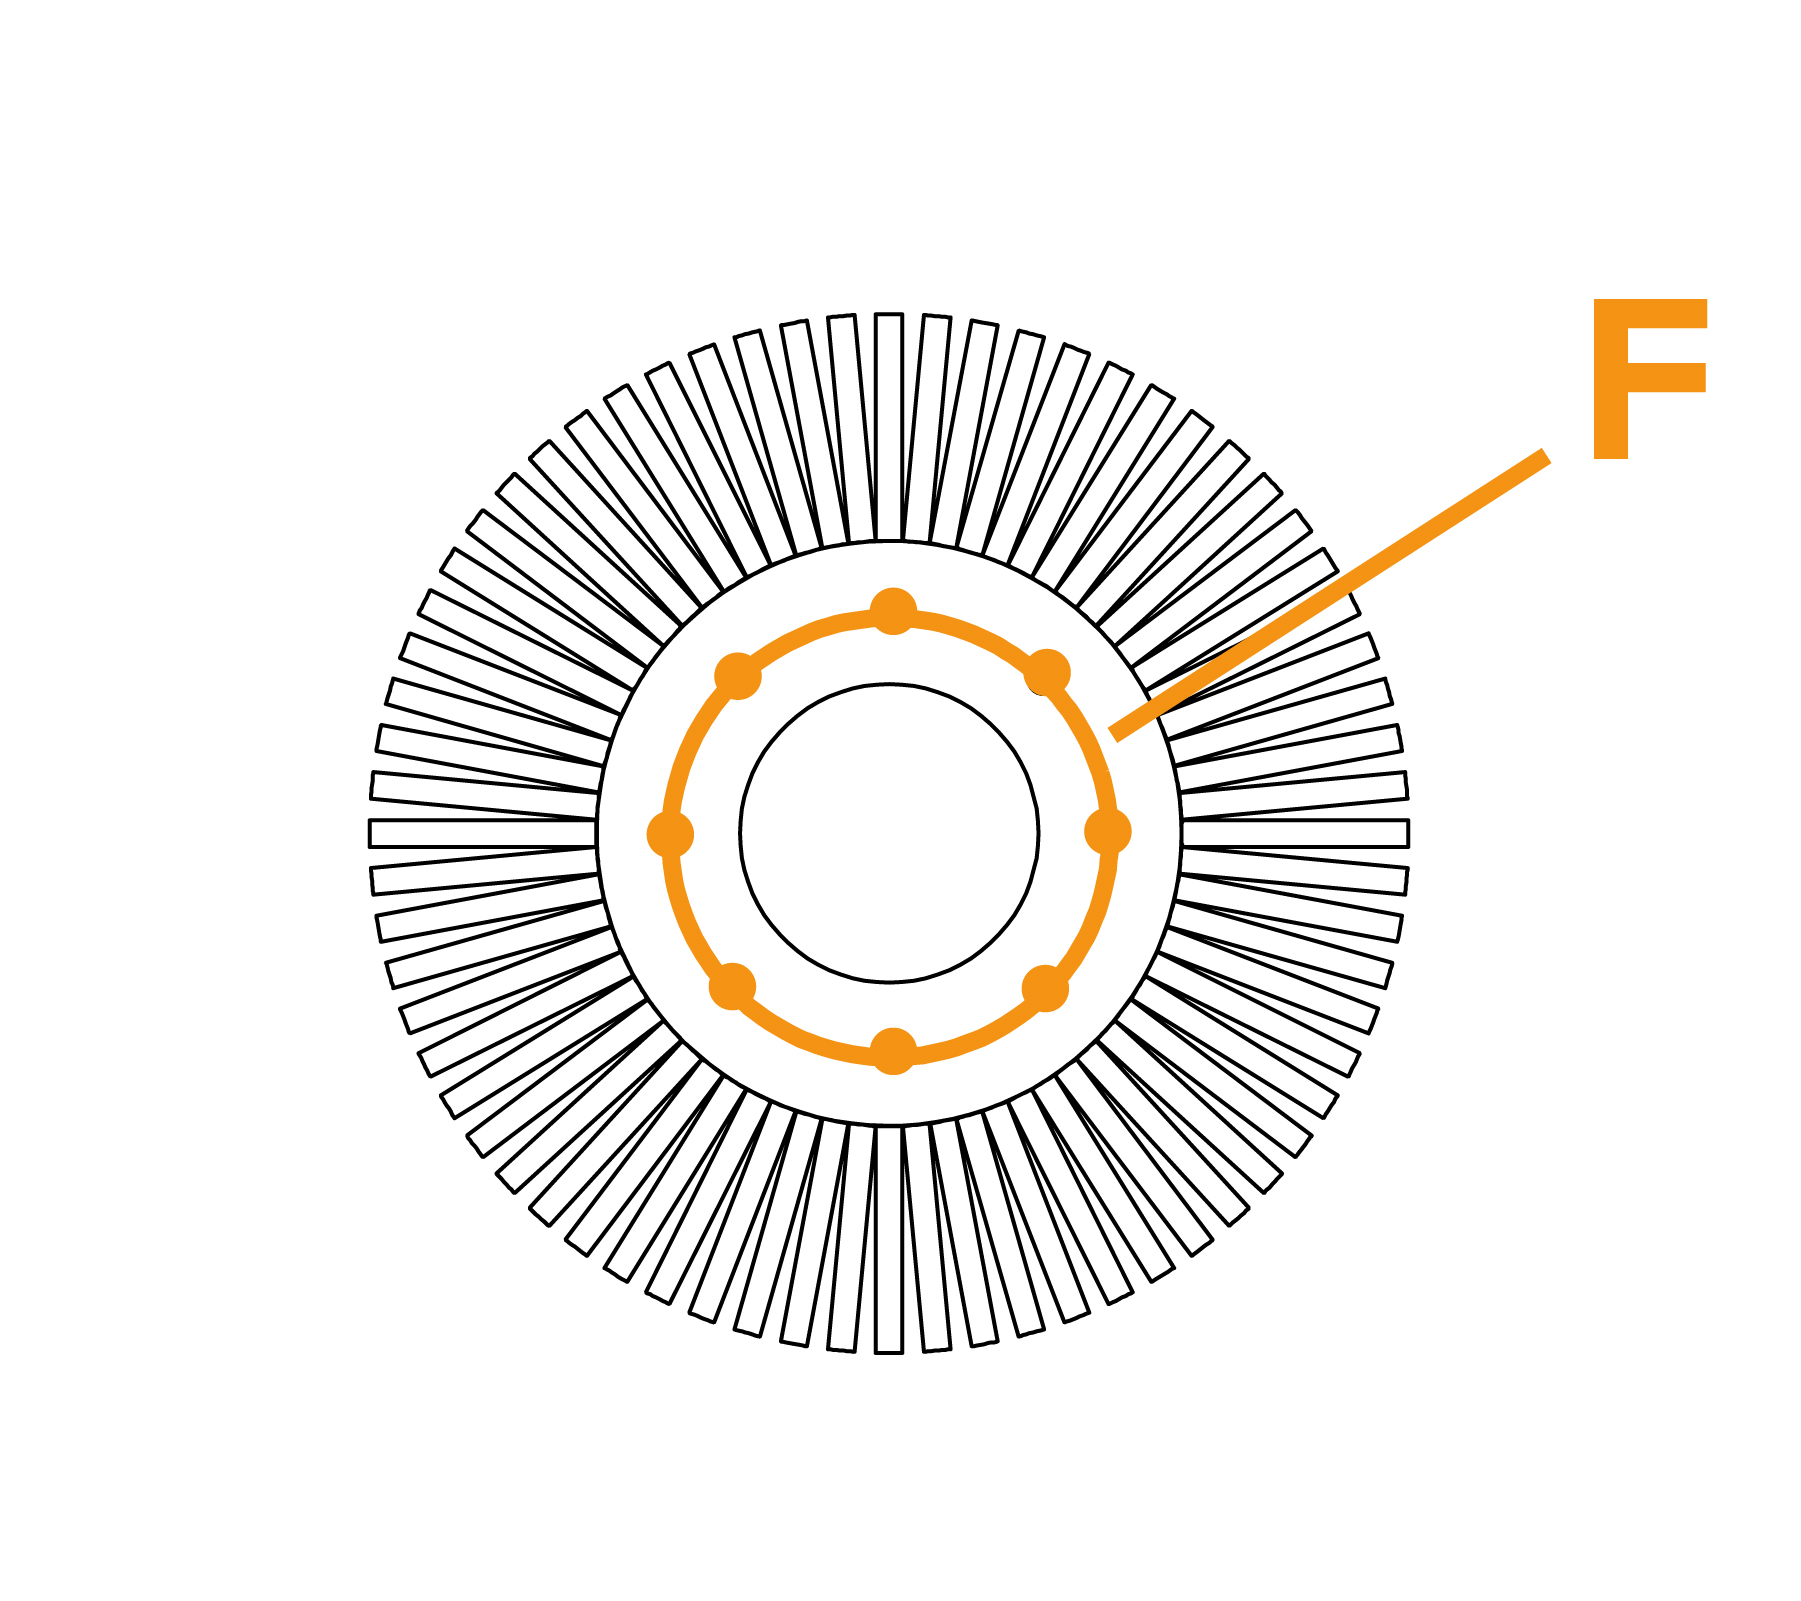 Potloodborstel met vaste kern - diagram F